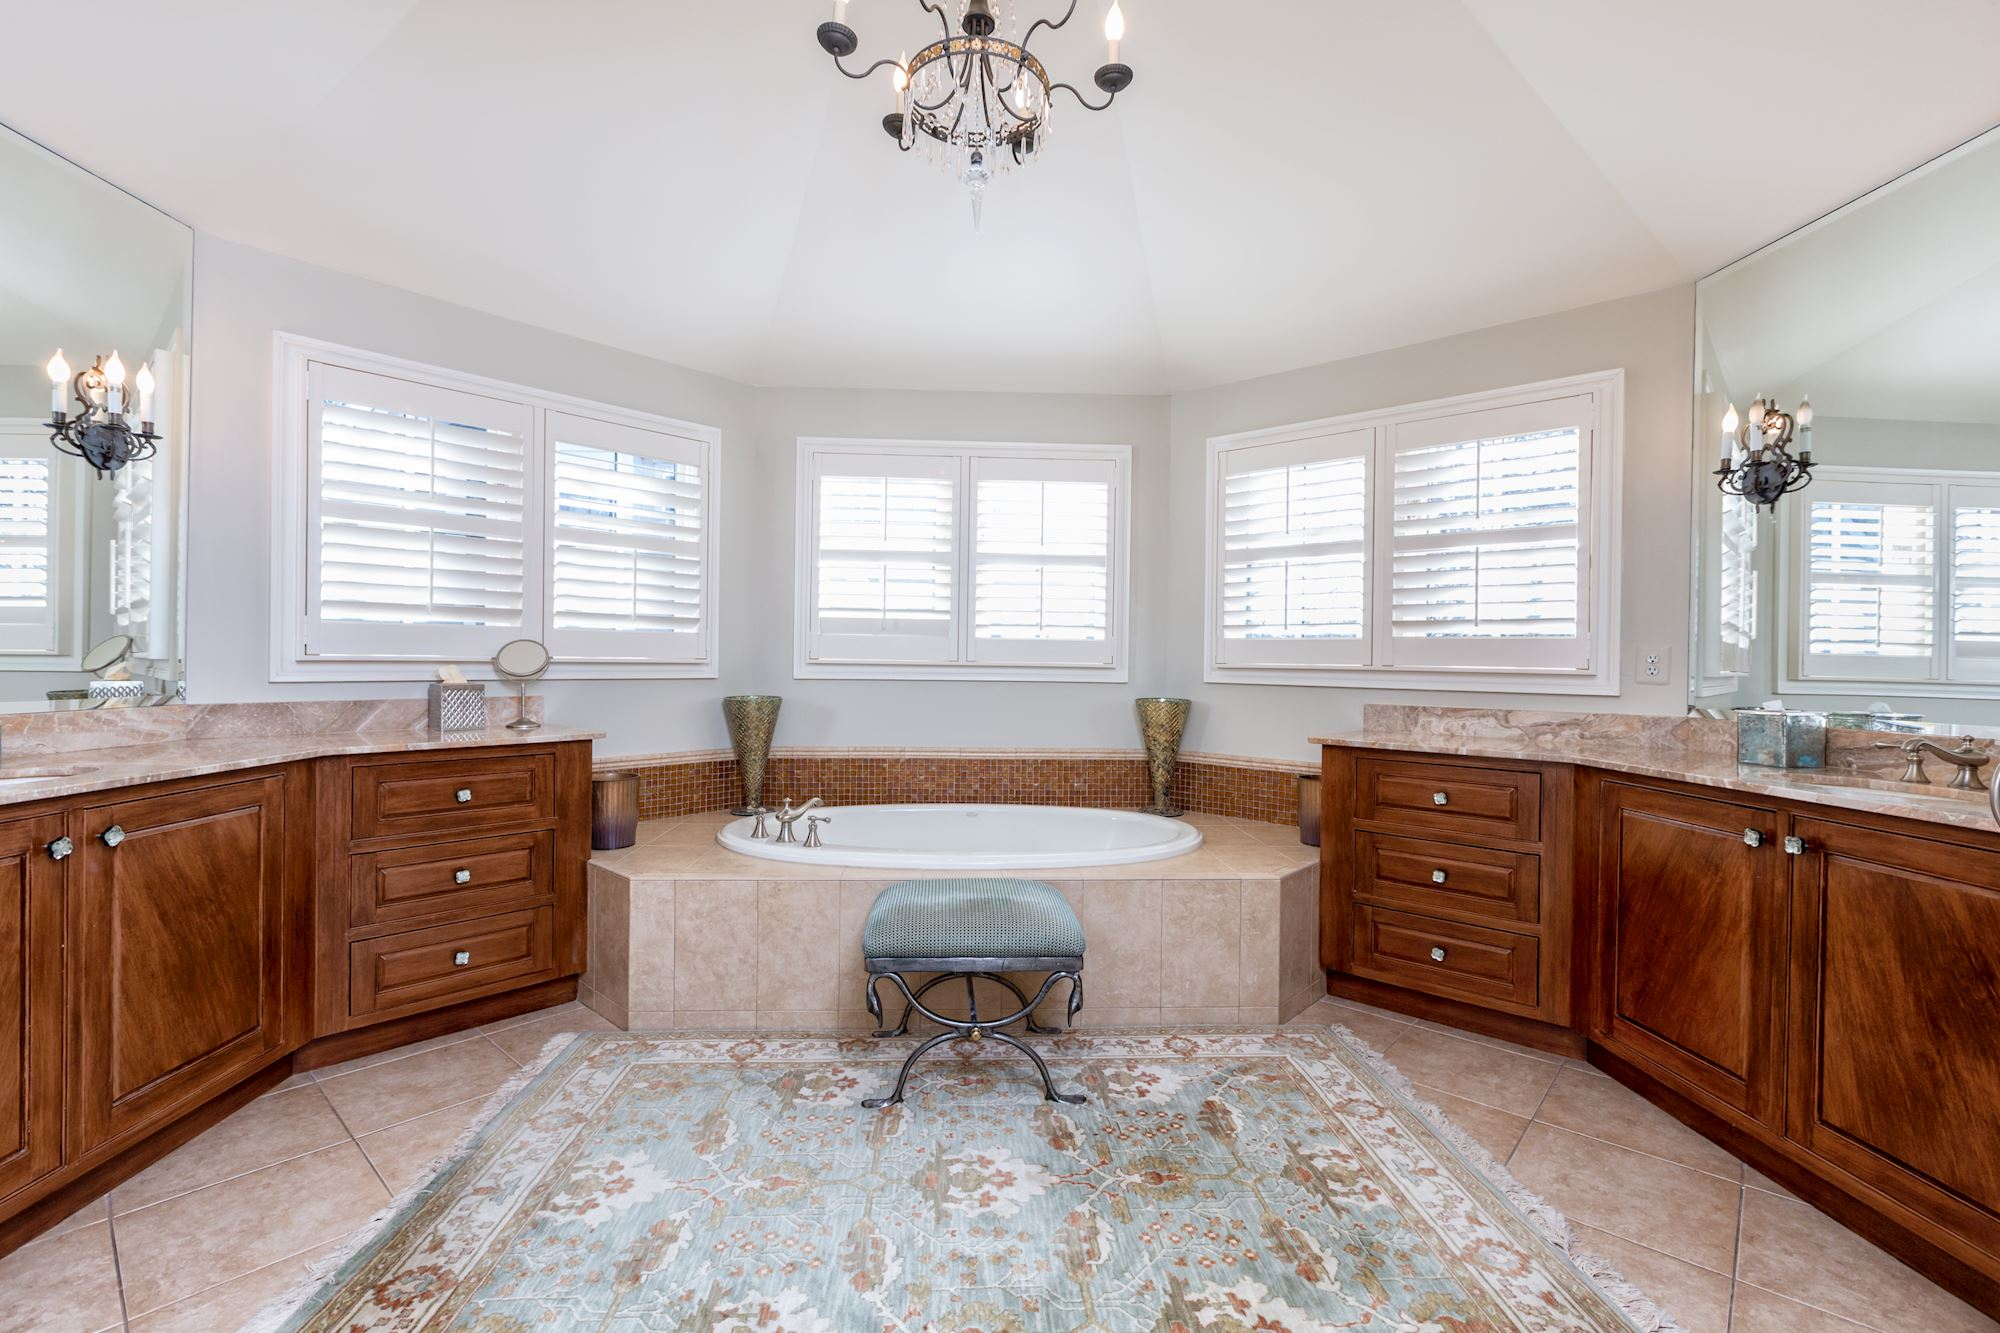 Bethesda Maryland Master Suite Remodeling: 7405 FAIRFAX RD, BETHESDA, MD 20814